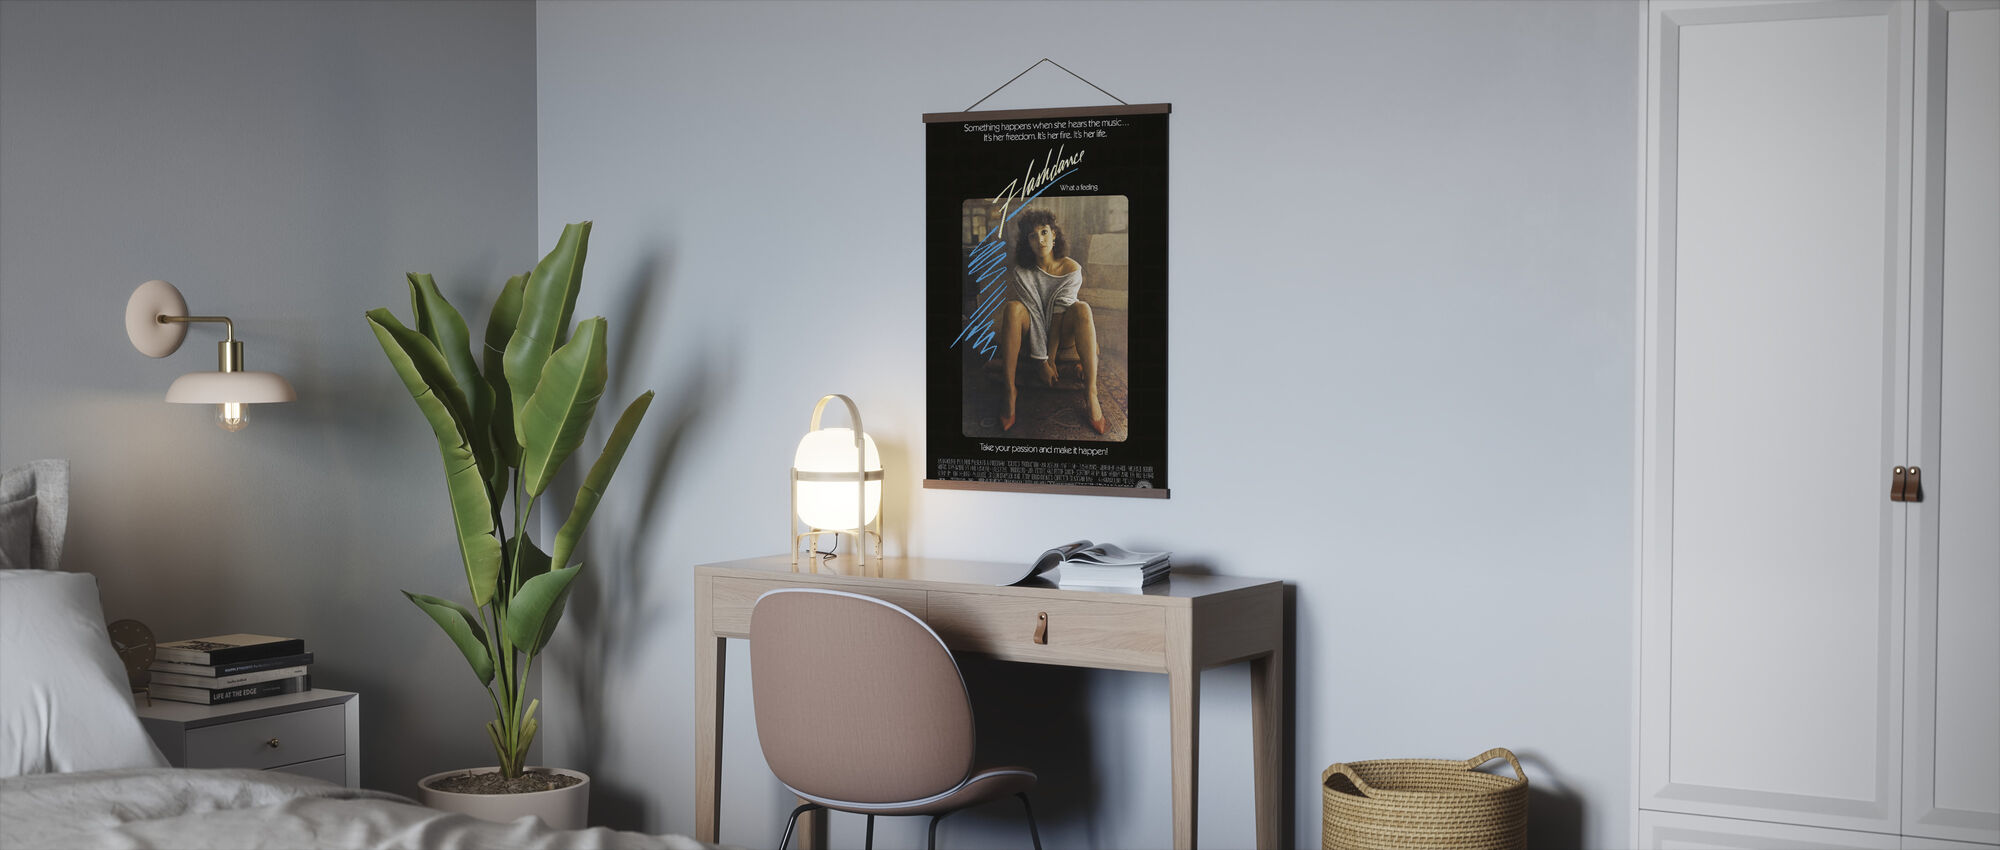 Flashdance - Poster - Office